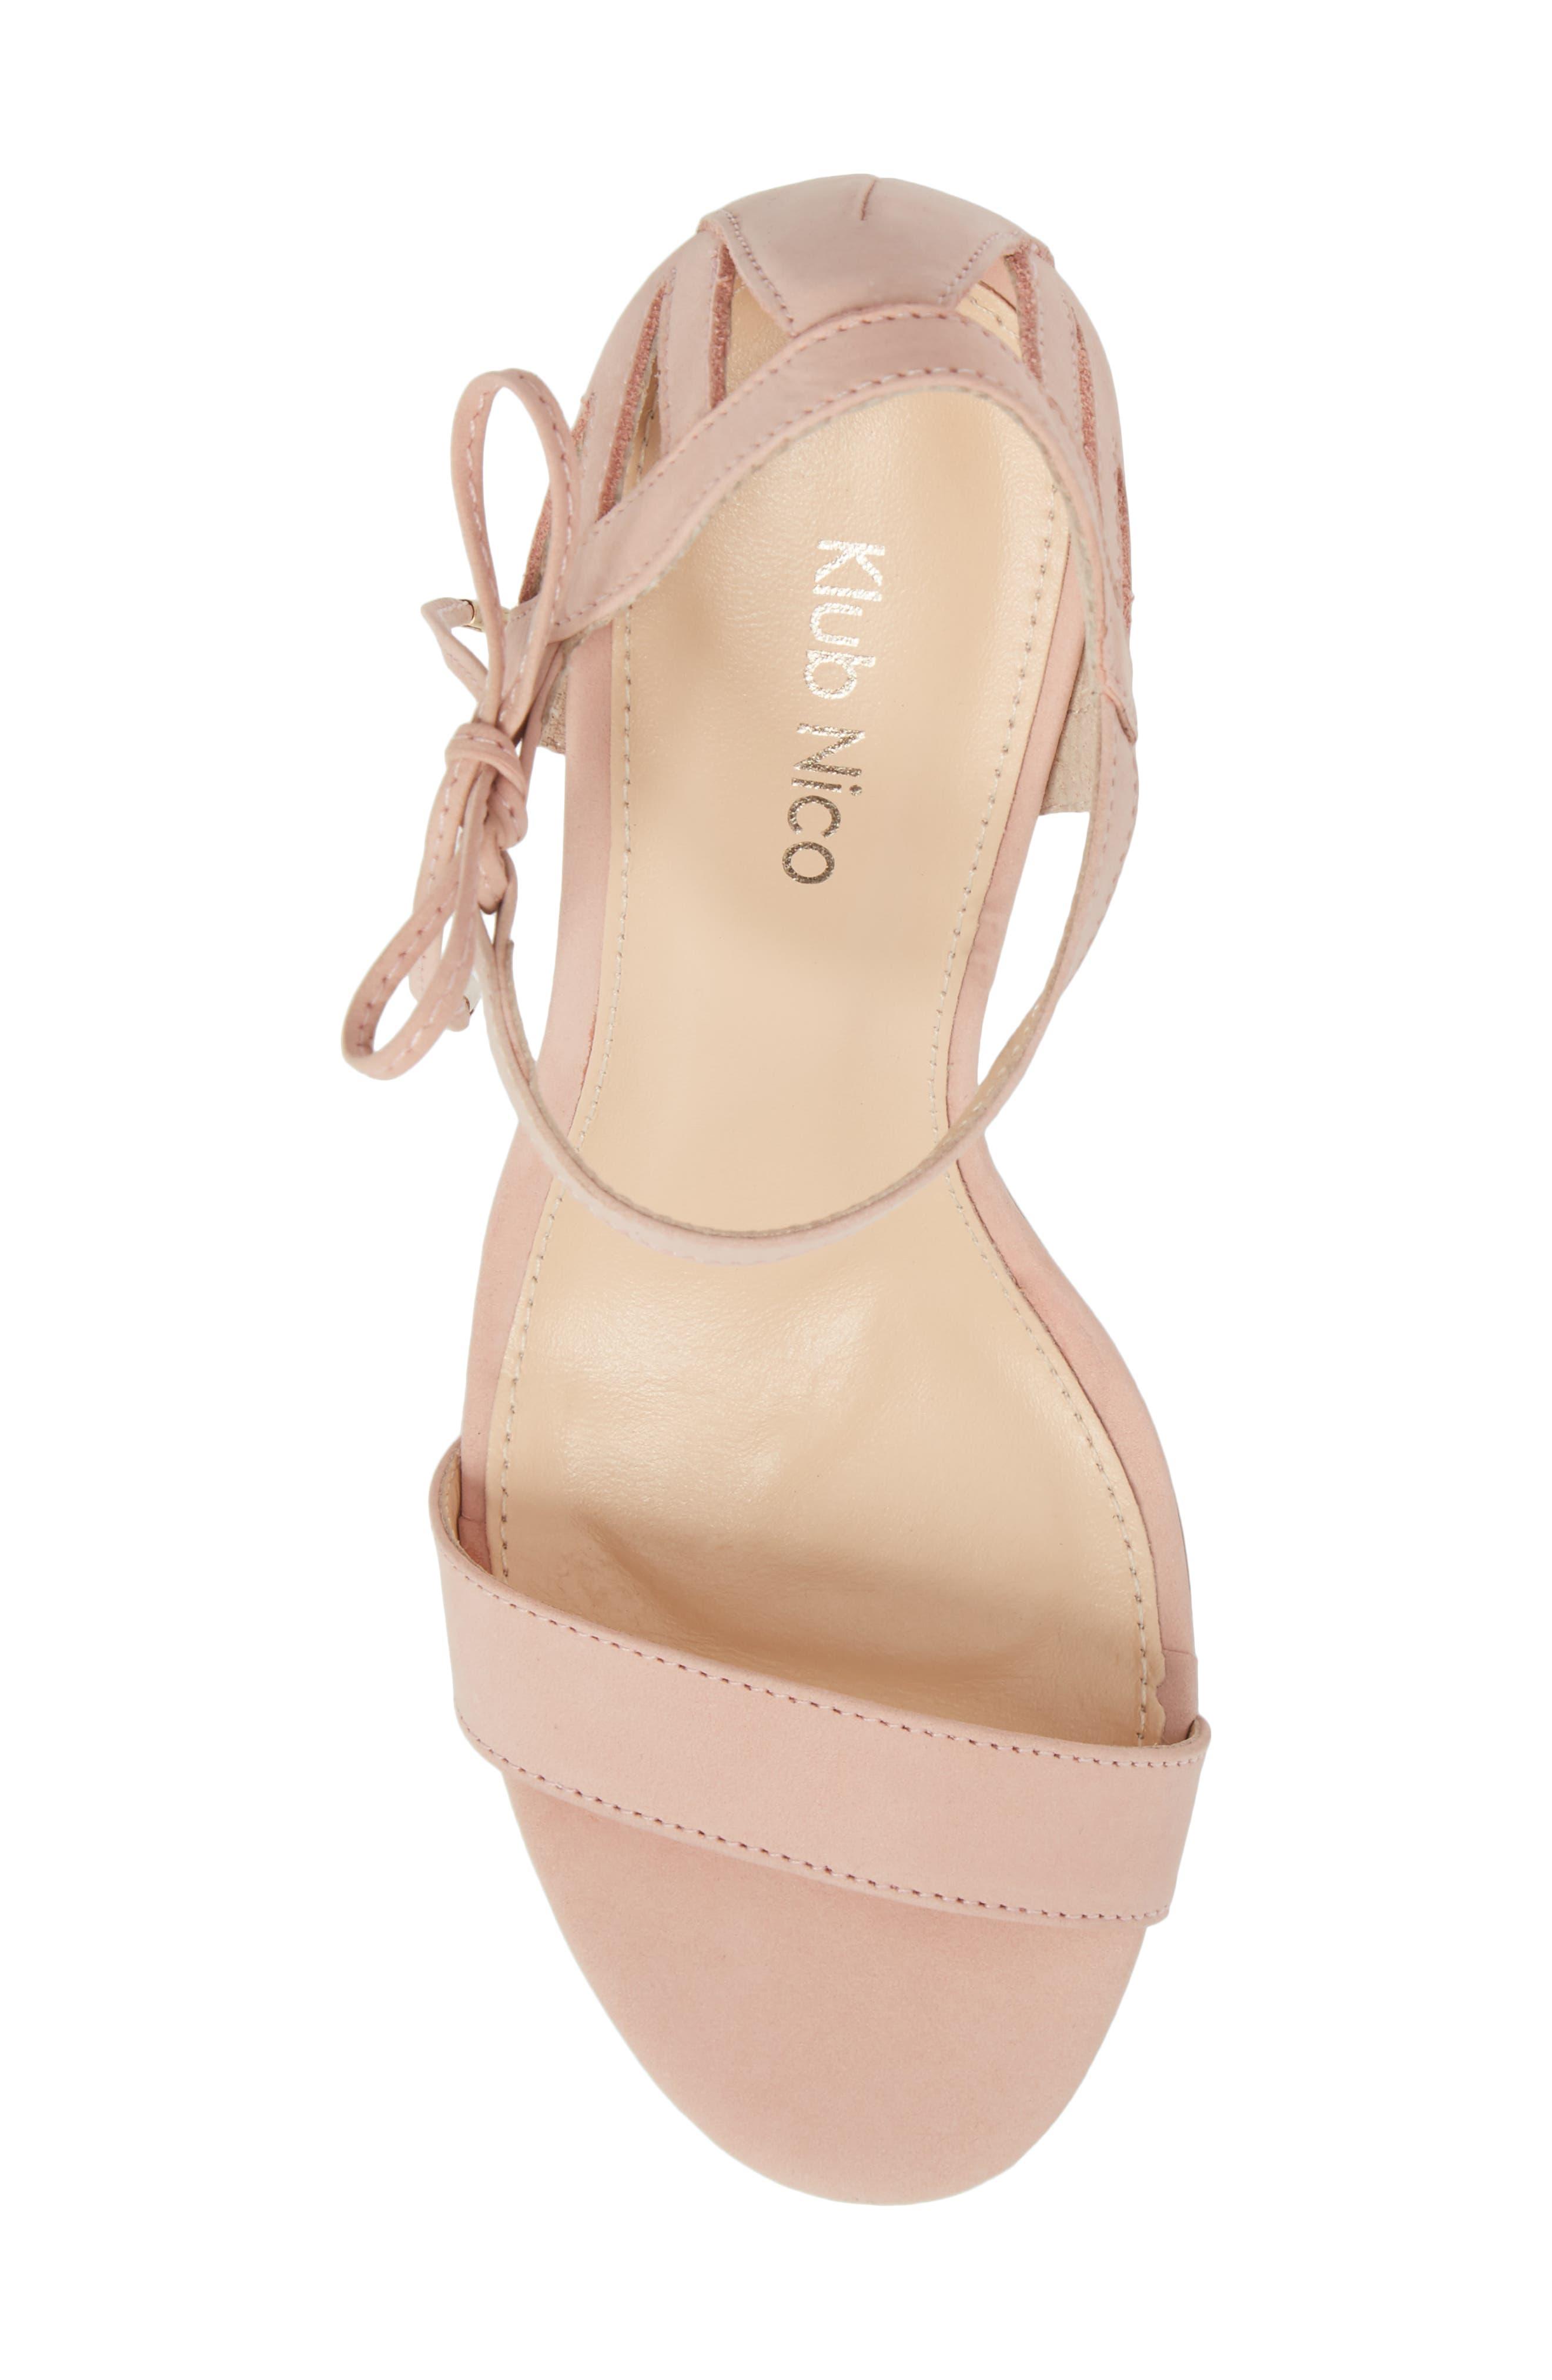 Adelyn Bow Tie Sandal,                             Alternate thumbnail 5, color,                             Quartz Leather